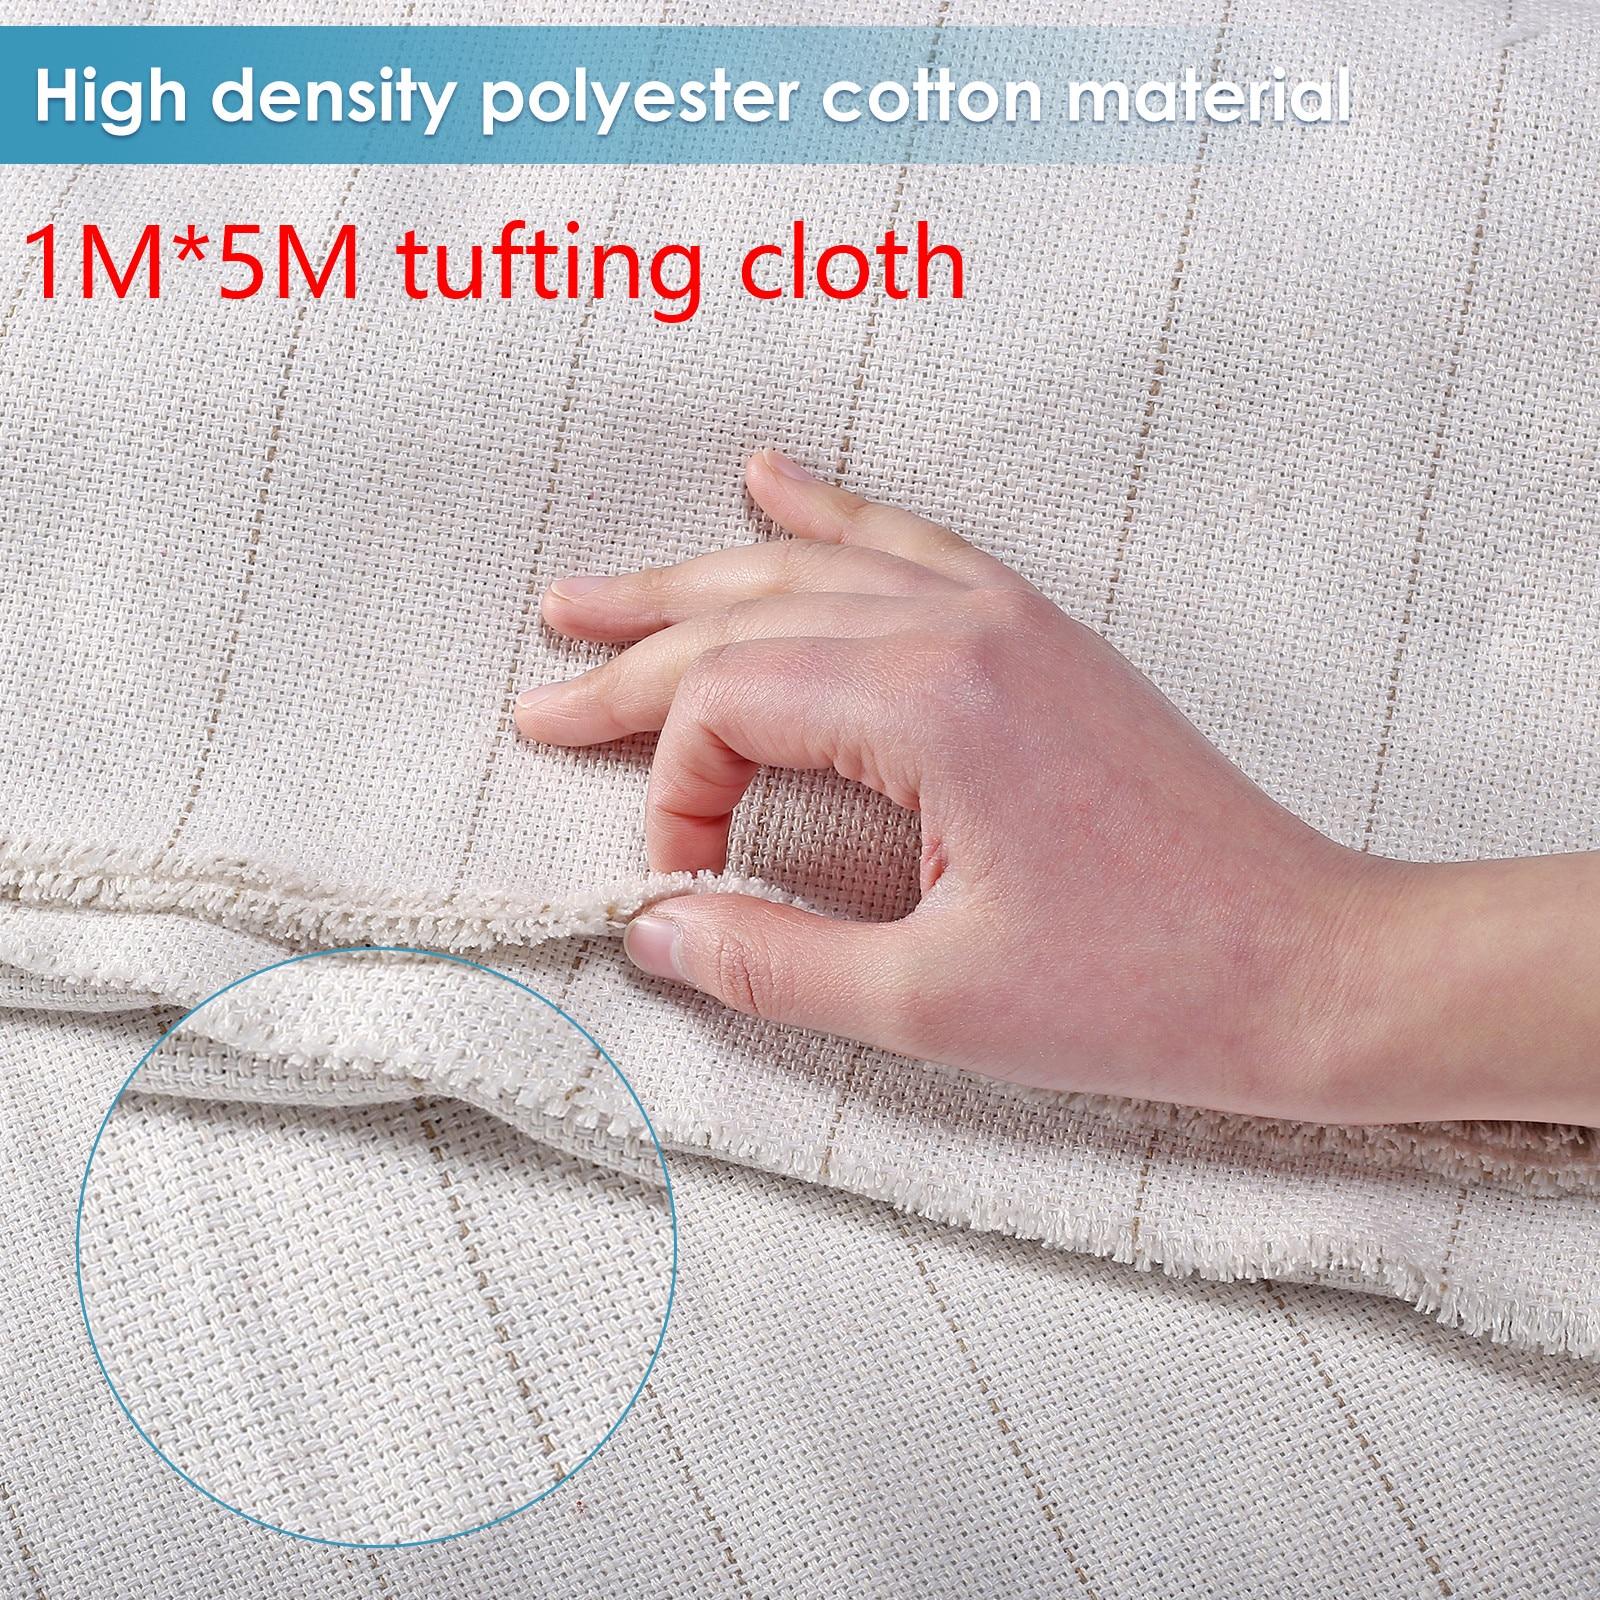 Primary tufting cloth Backing Fabric for using Rug tufting guns width 5m for Loop Pile Cut Loop Pile UK US EU Plug TD-01 TD-02